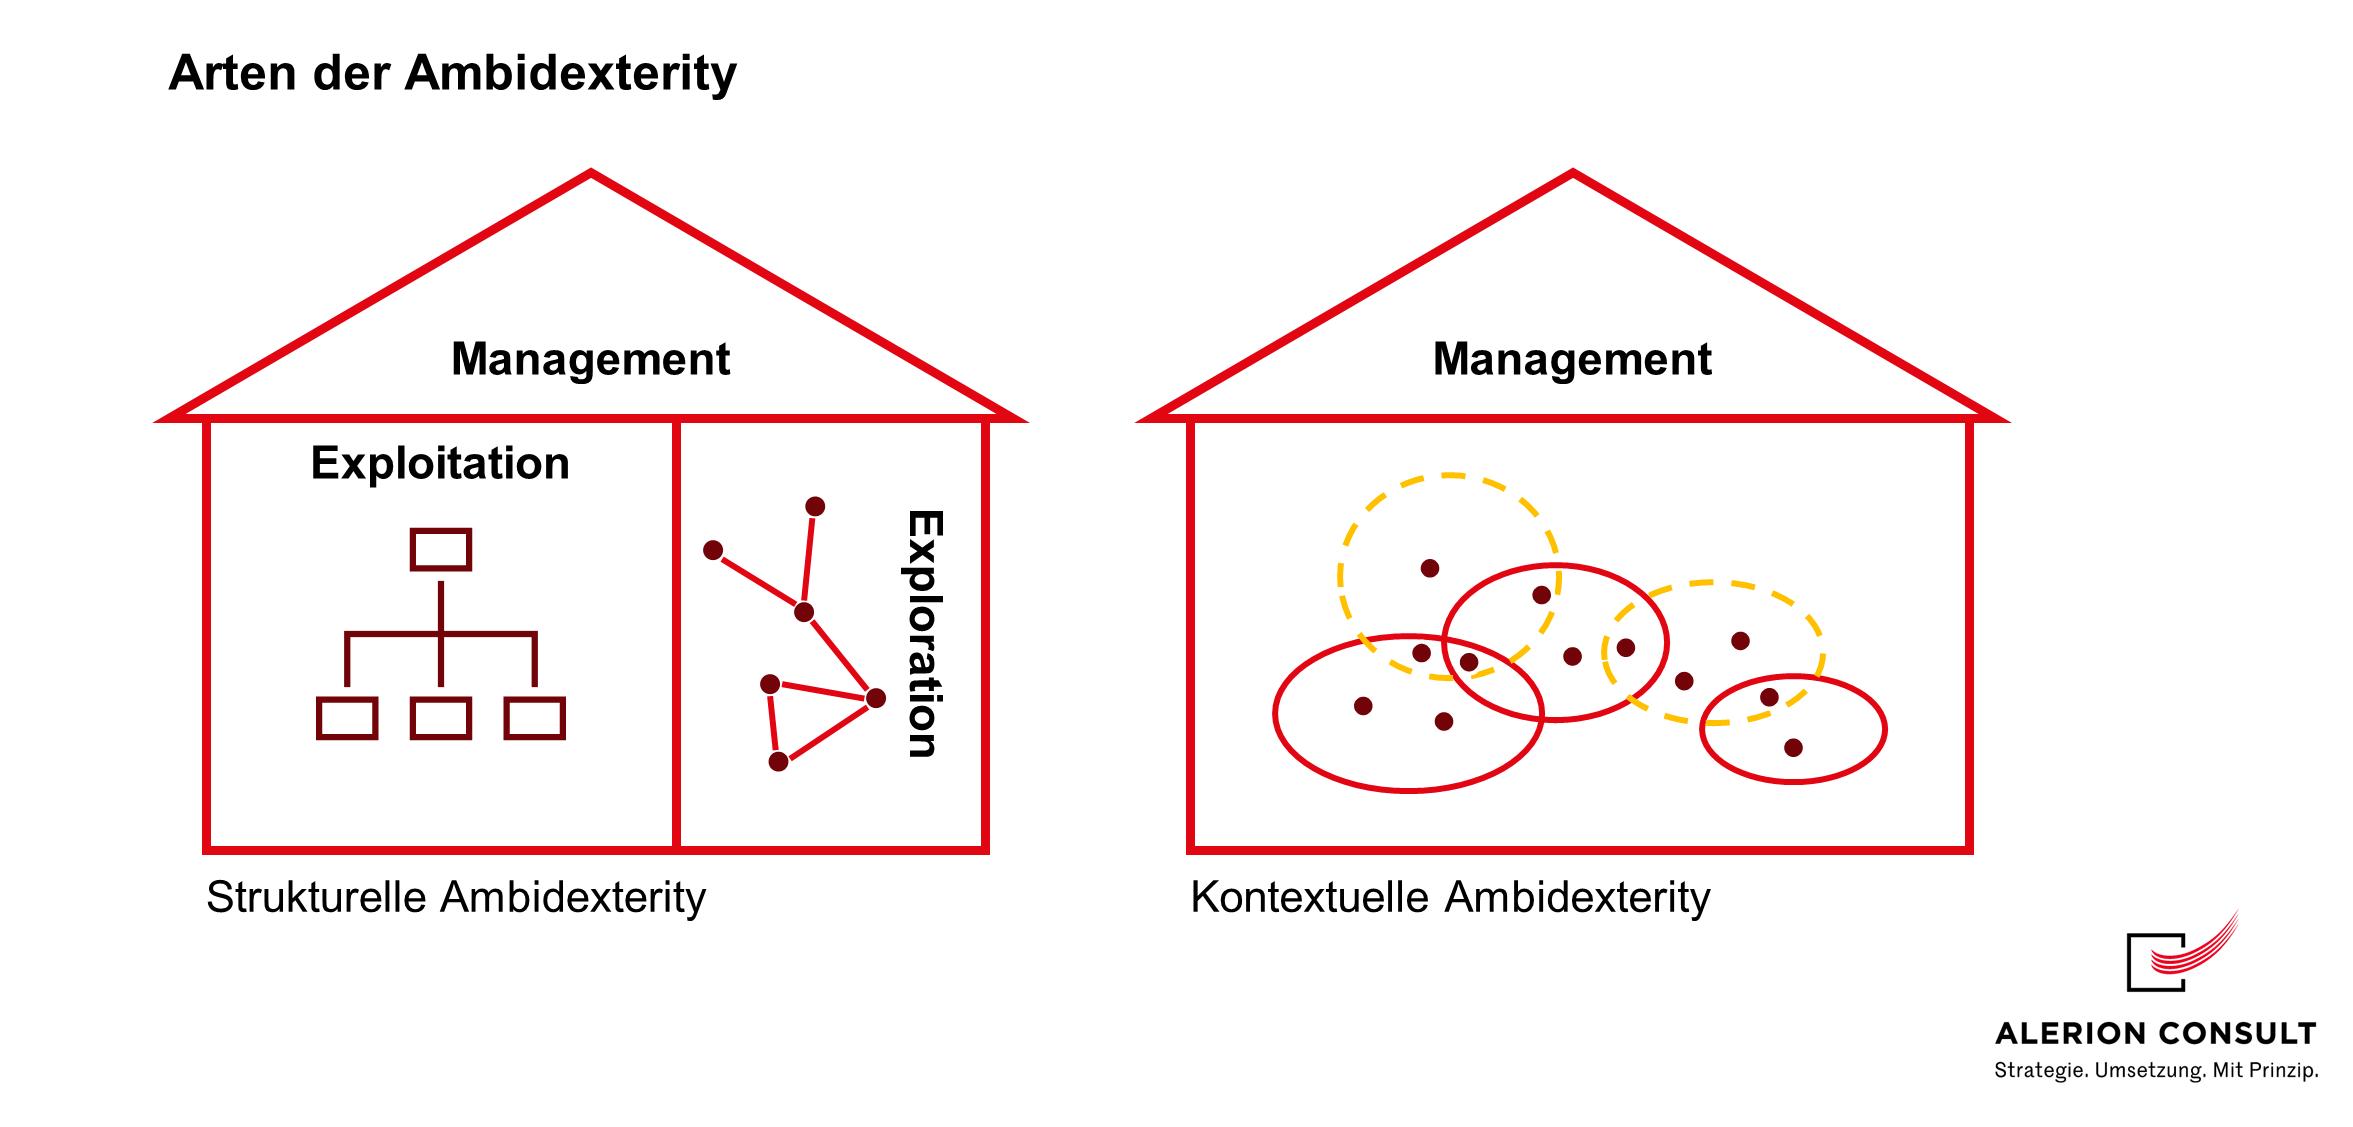 Arten der Ambidexterity